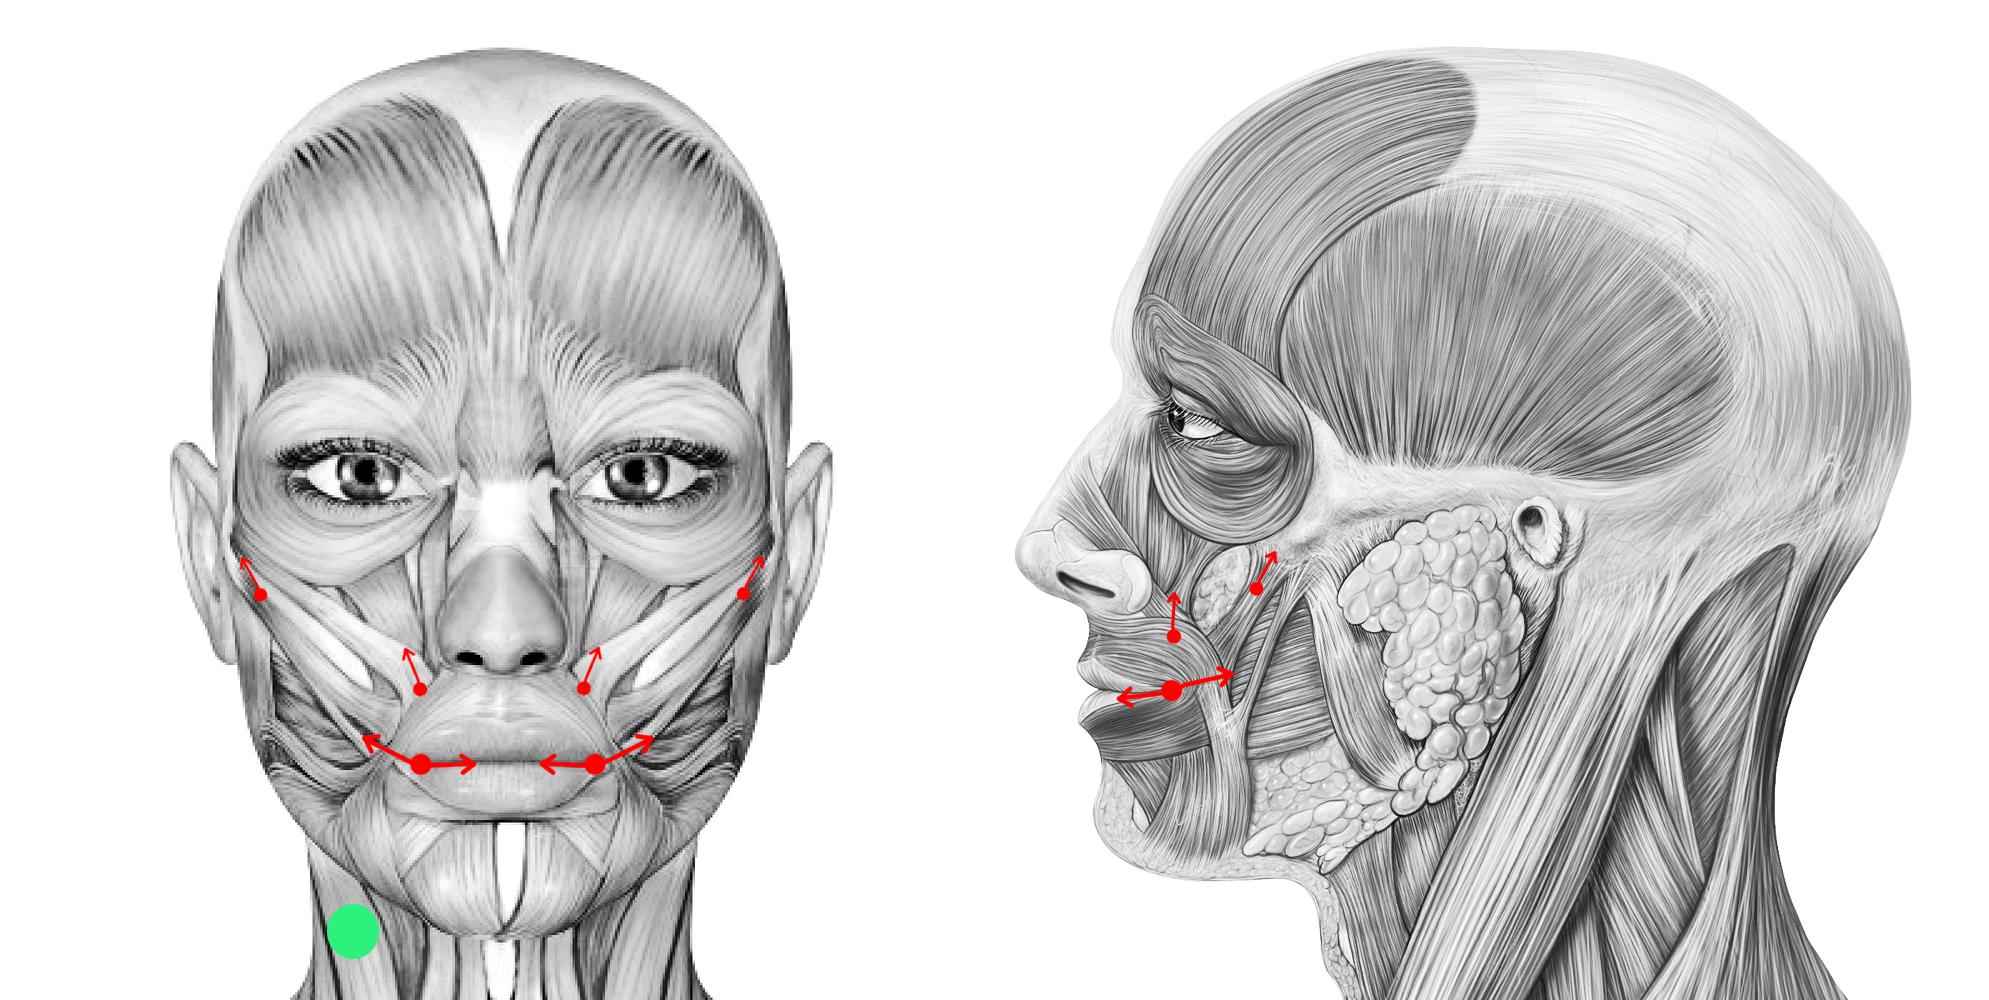 Facial muscles diagram, cote de pablo nudepics